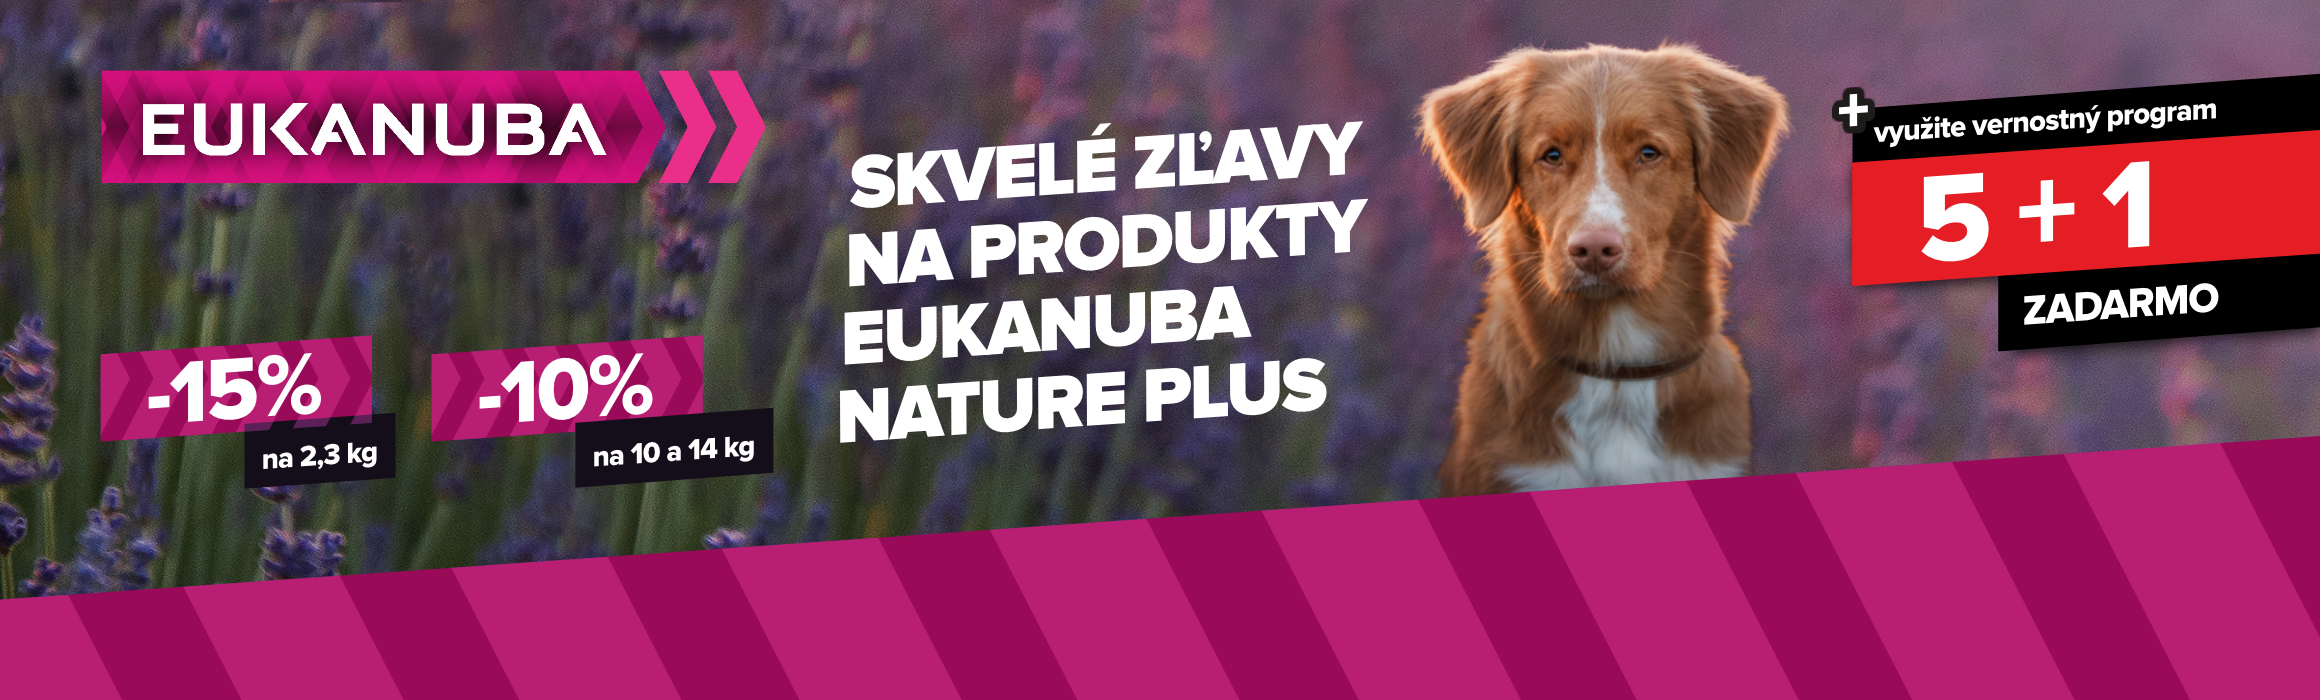 EUKANUBA Zľavy na produkty Eukanuba Plus